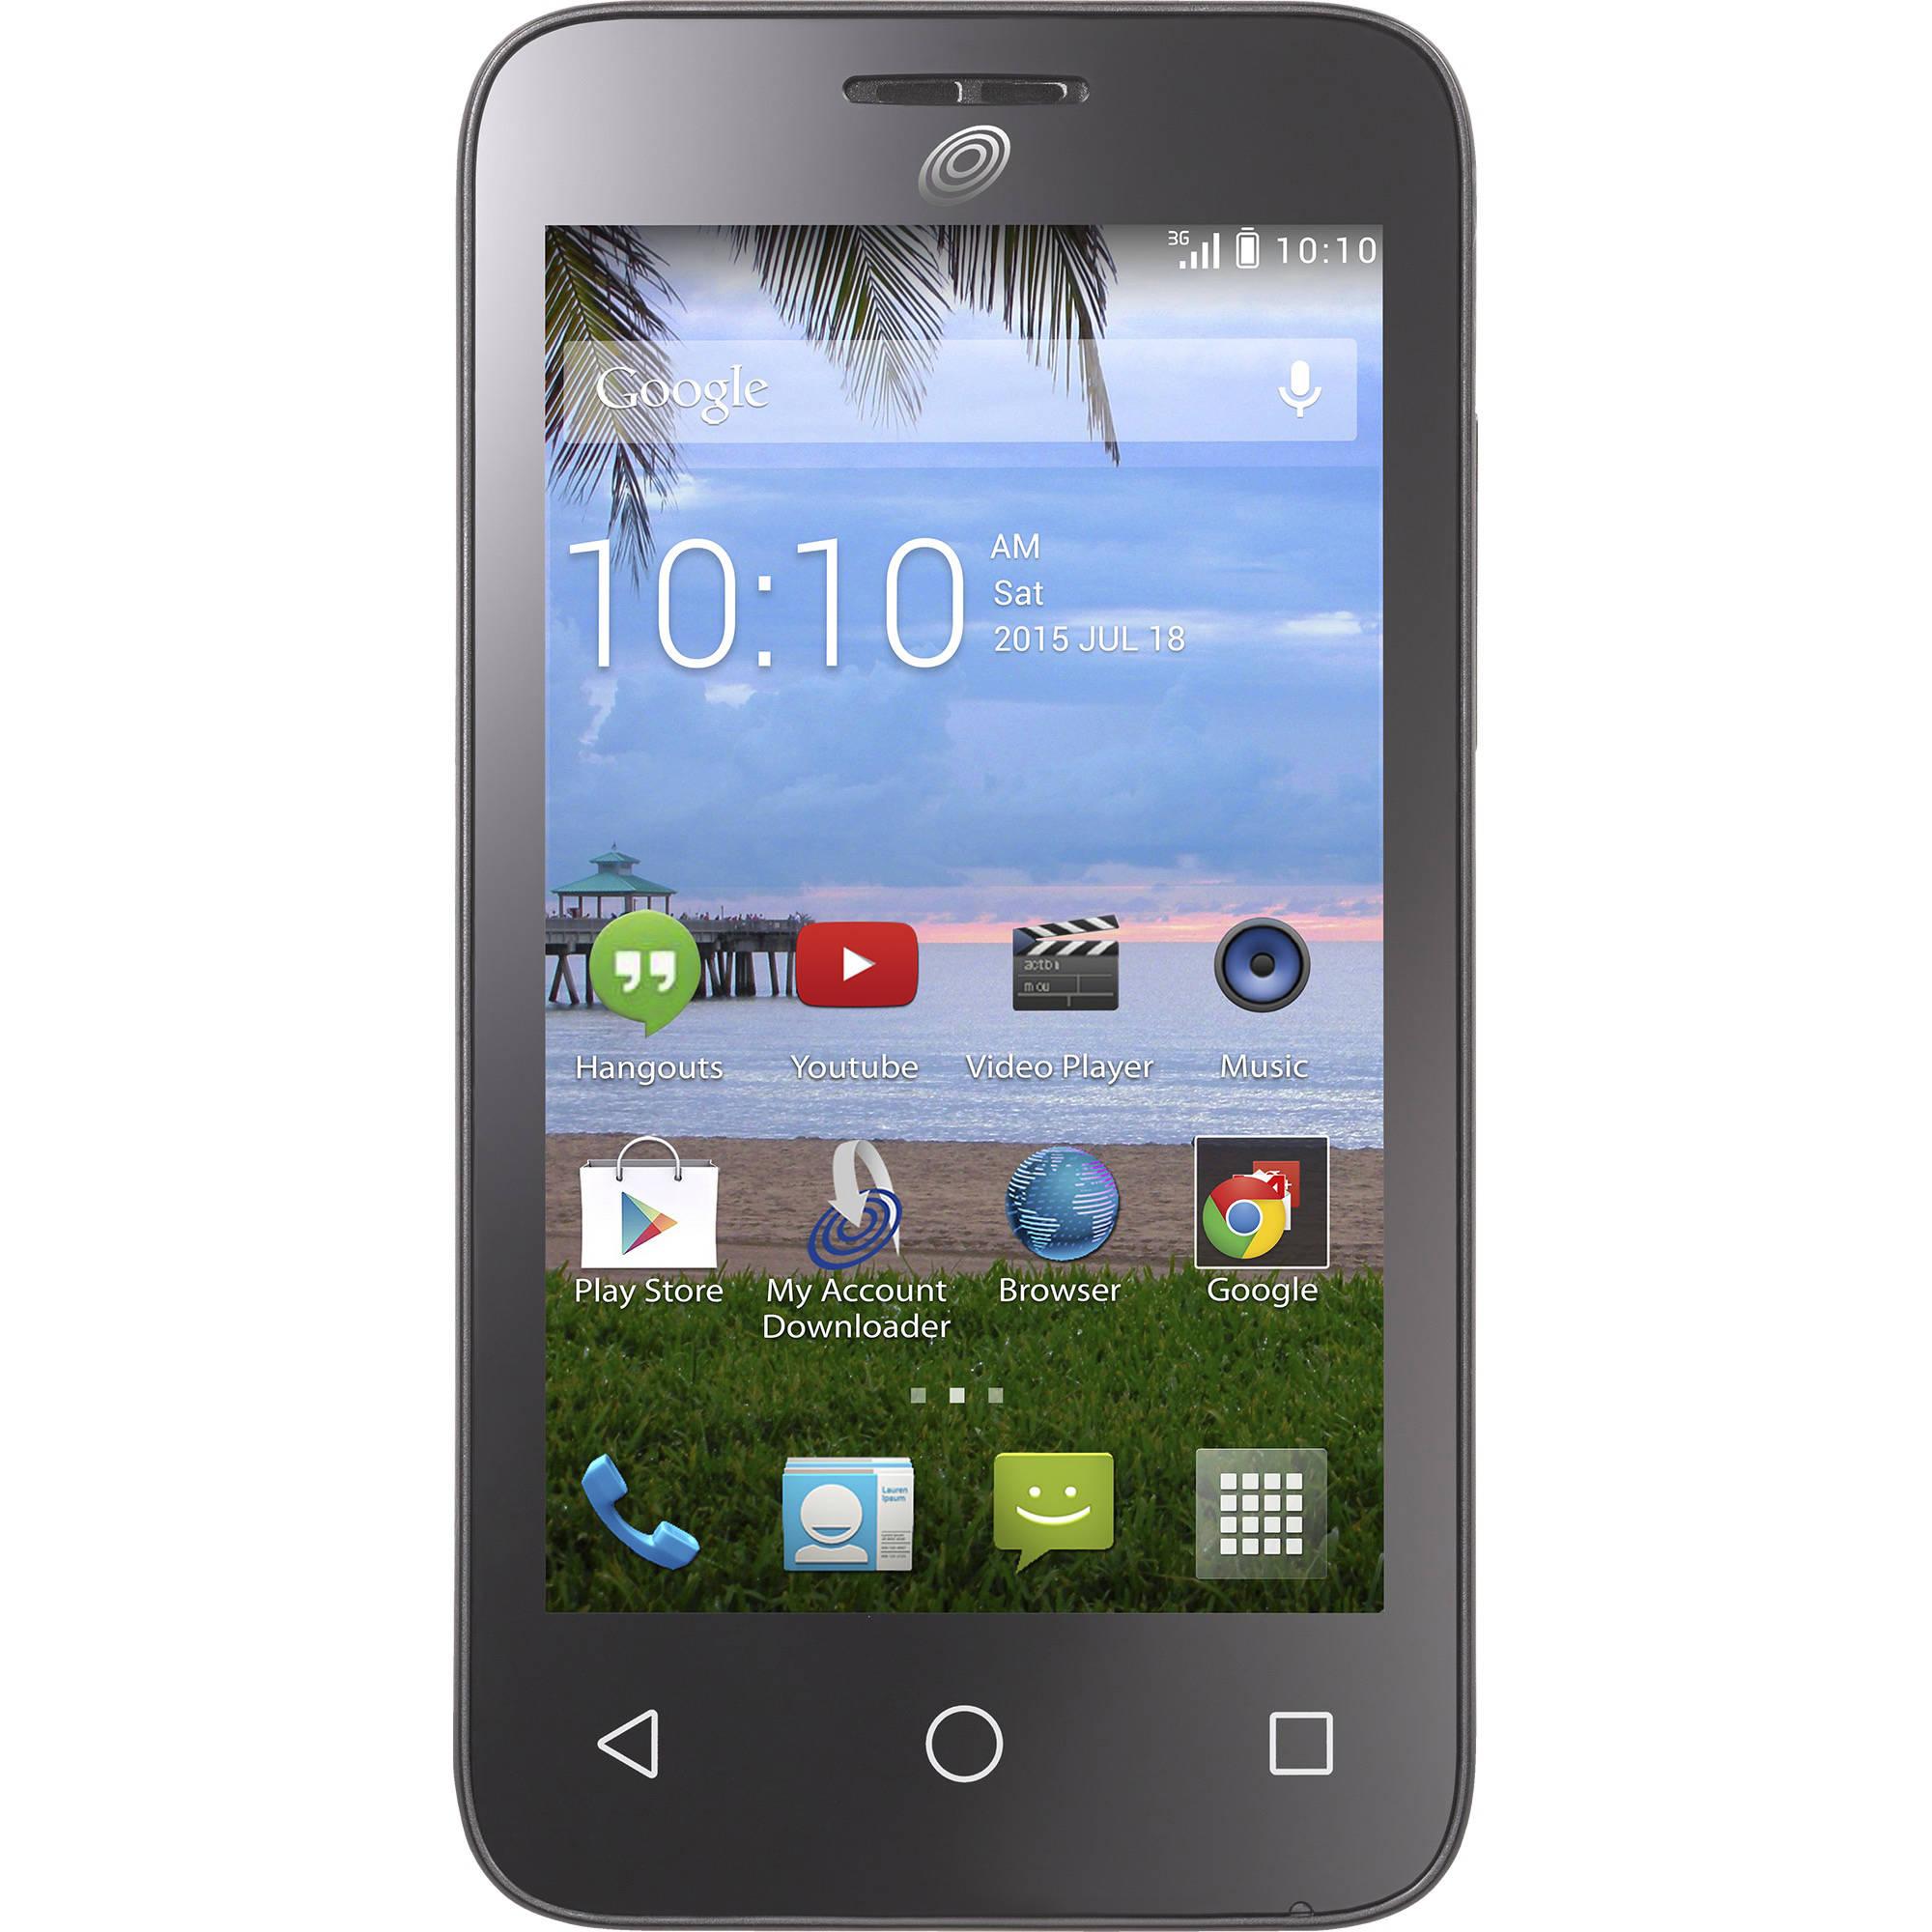 Tracfone Alcatel Pixi Pulsar Android Prepaid Smartphone Walmart Com